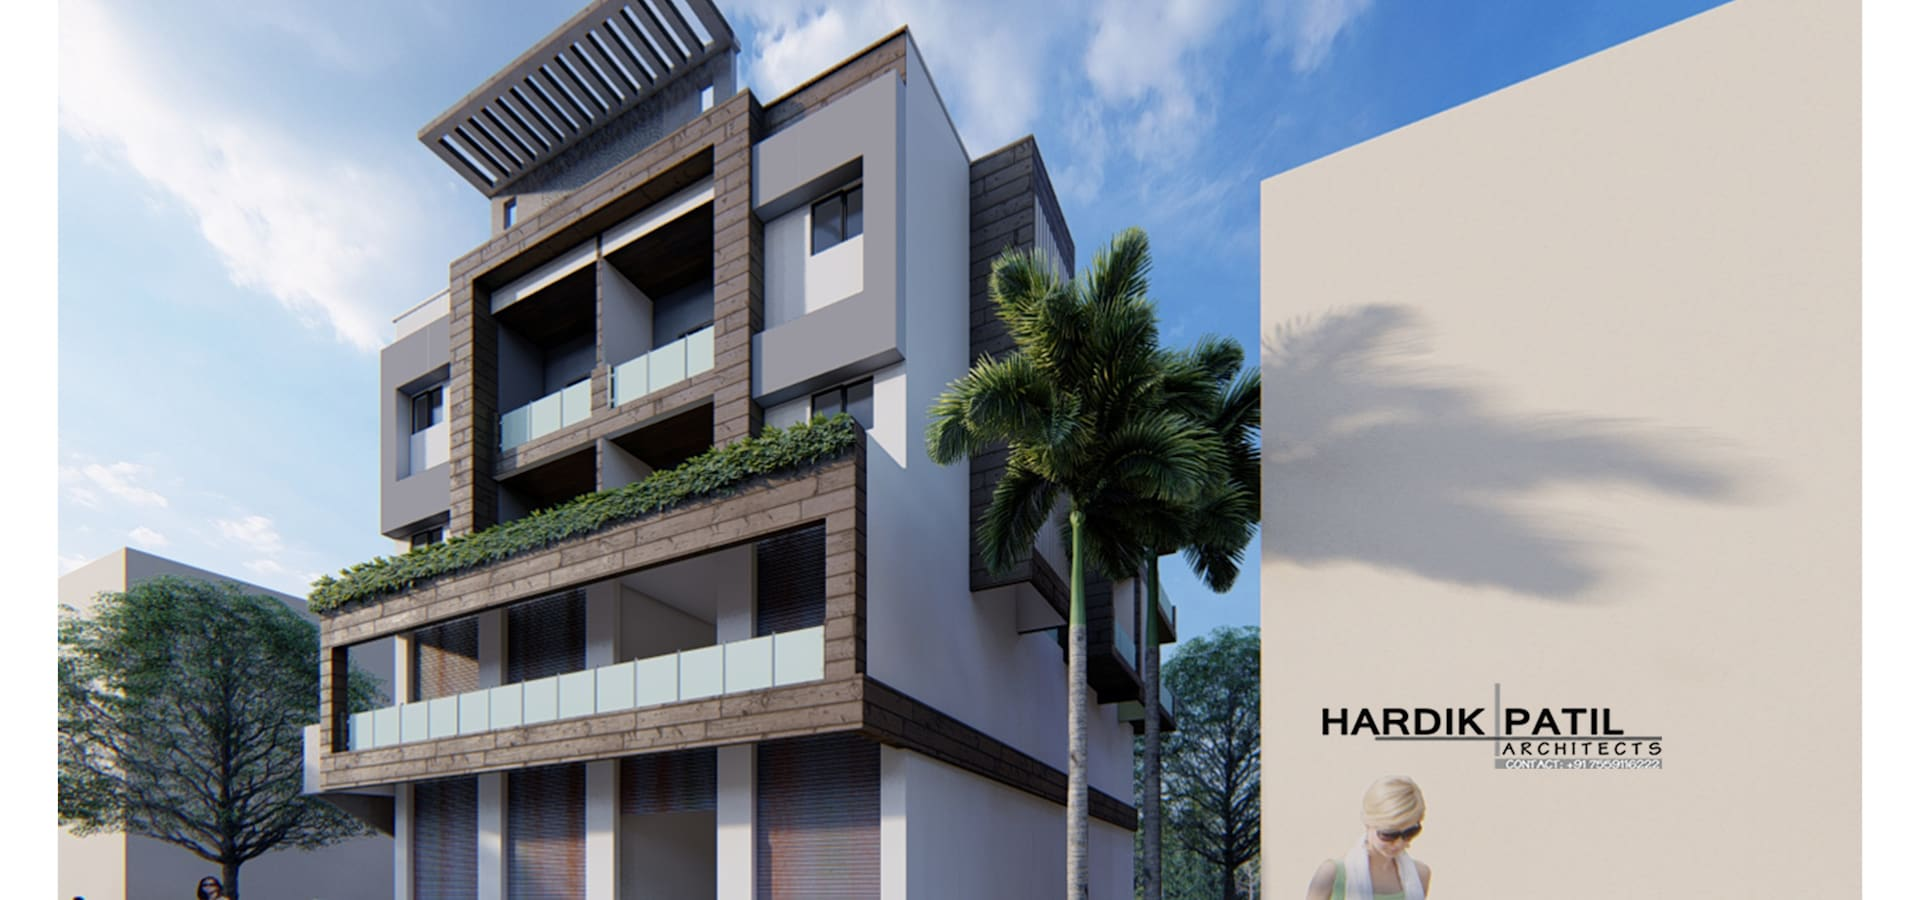 HARDIK PATIL ARCHITECTS